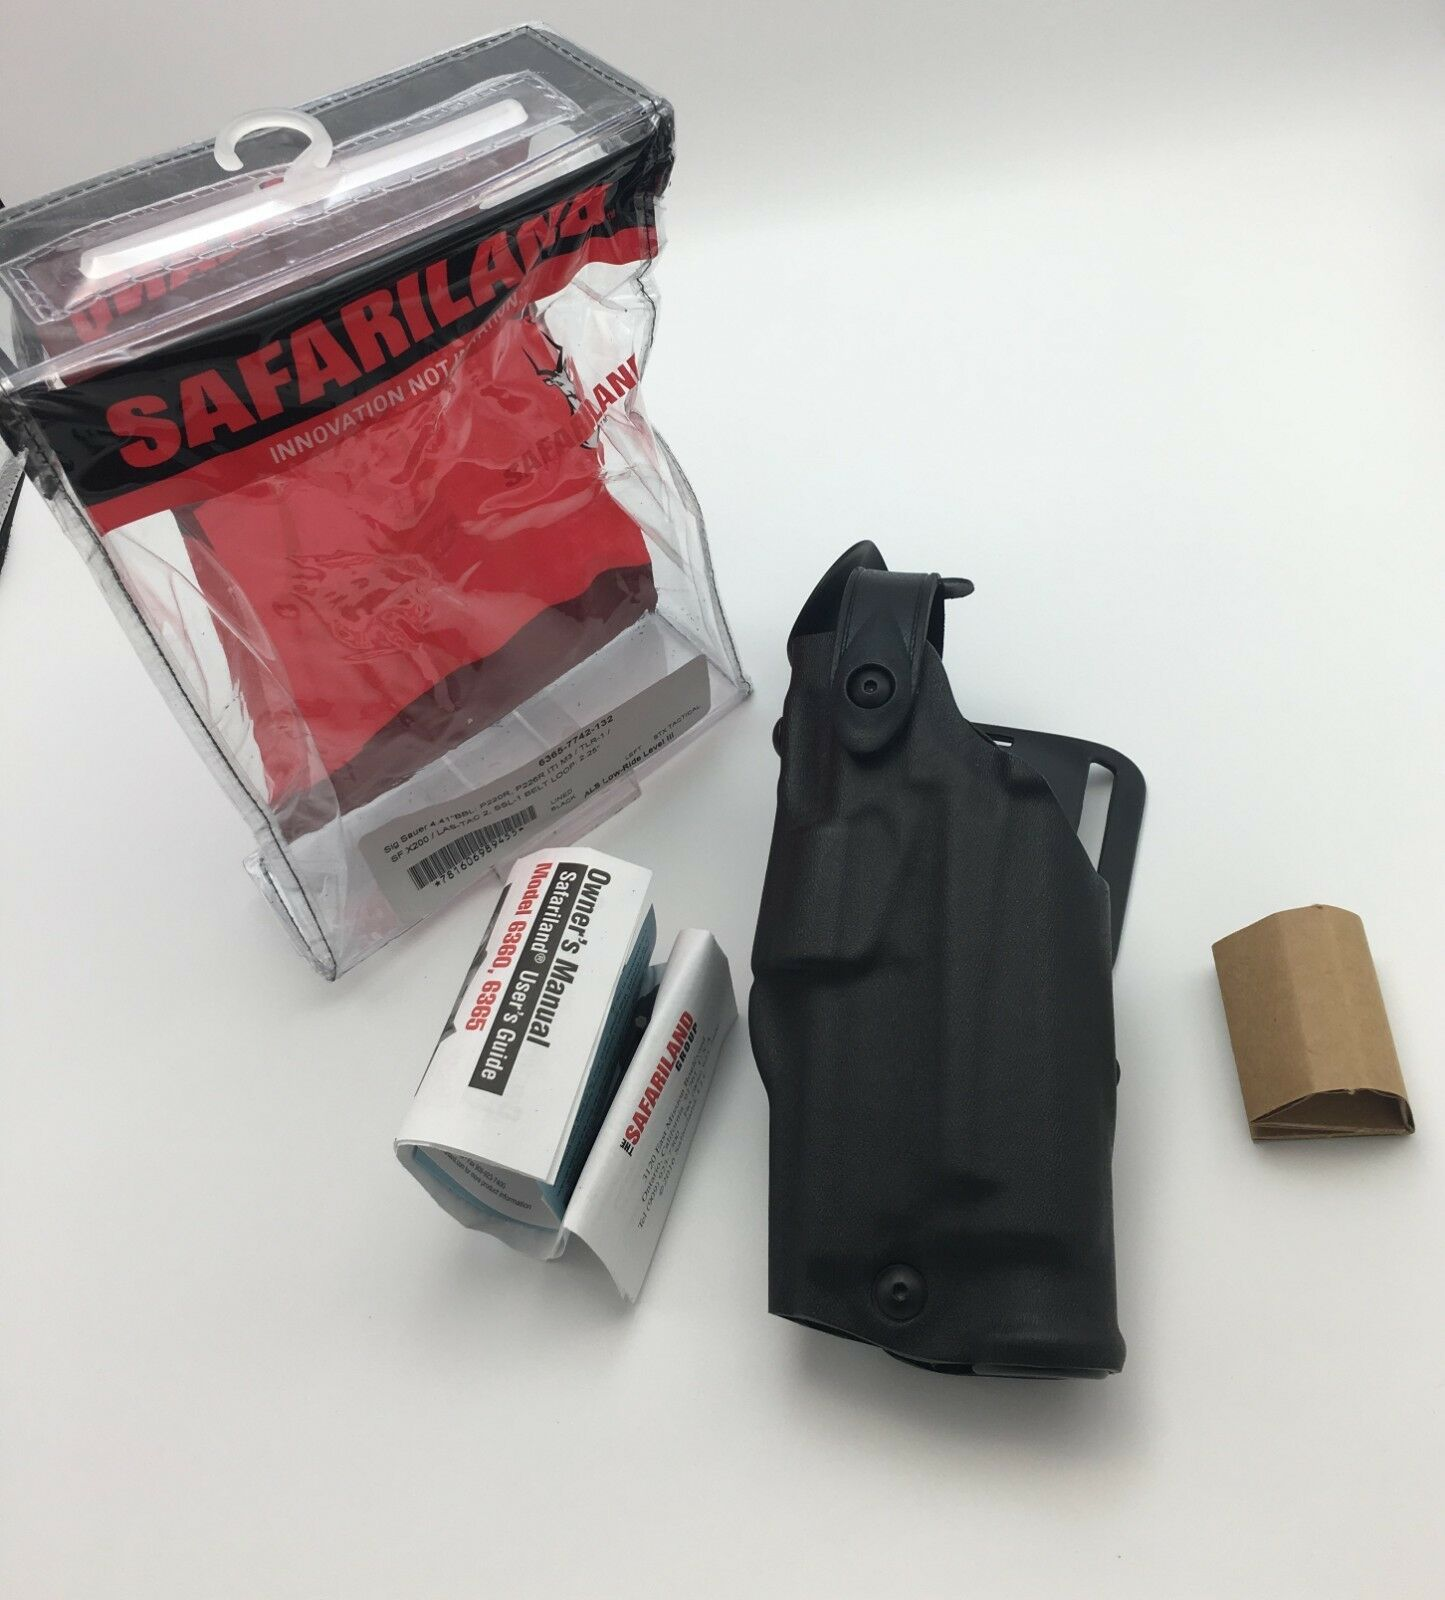 Fits SIG 226 220 w  LIGHT   Safariland 6365 ALS SLS Level 3 Duty LH Holster STX